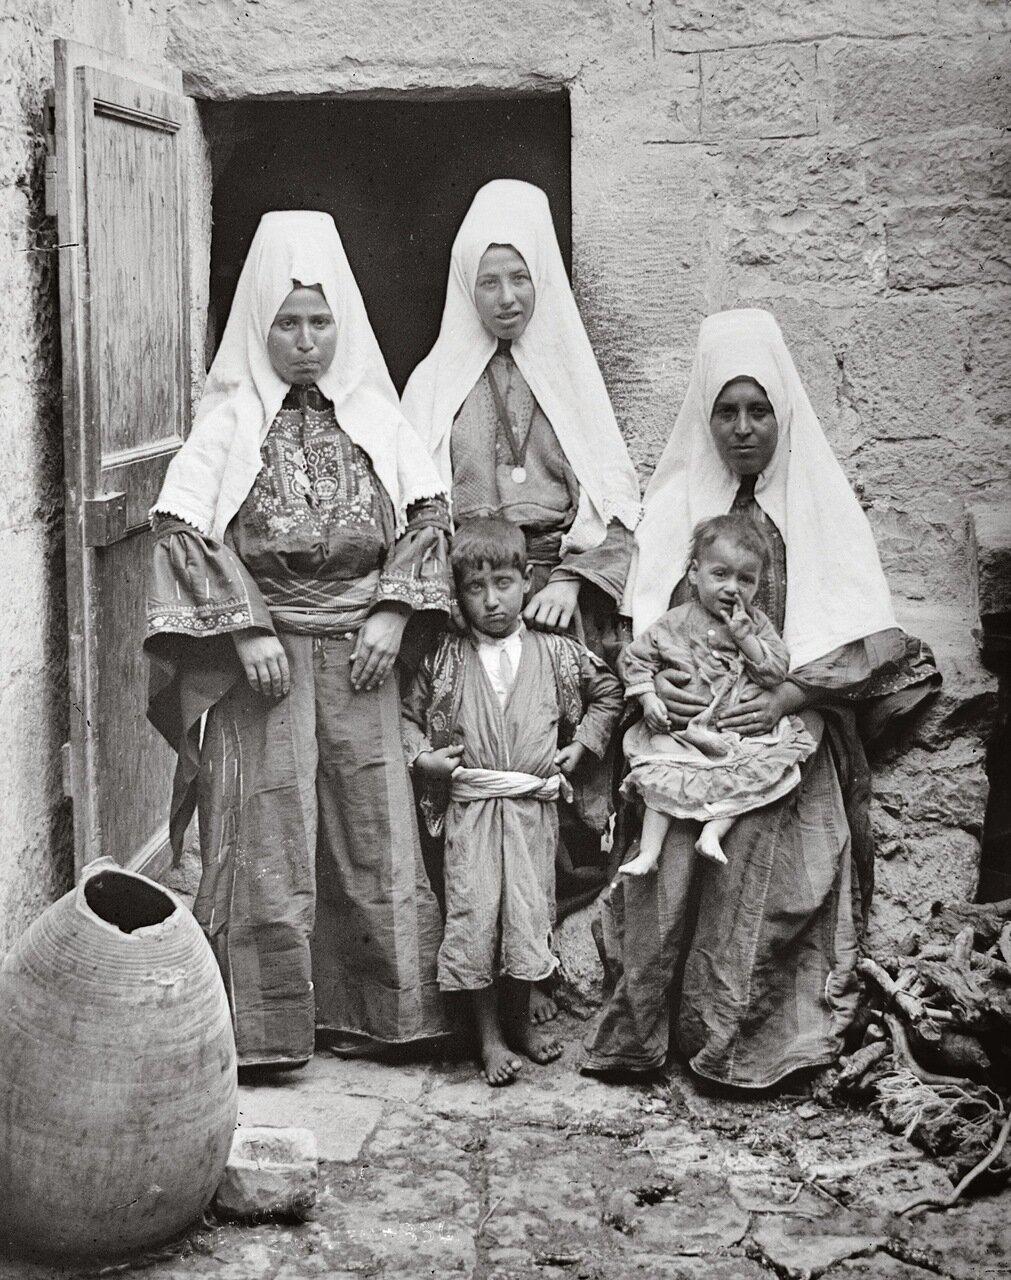 Жители Вифлеема, Палестина. 1900-1920